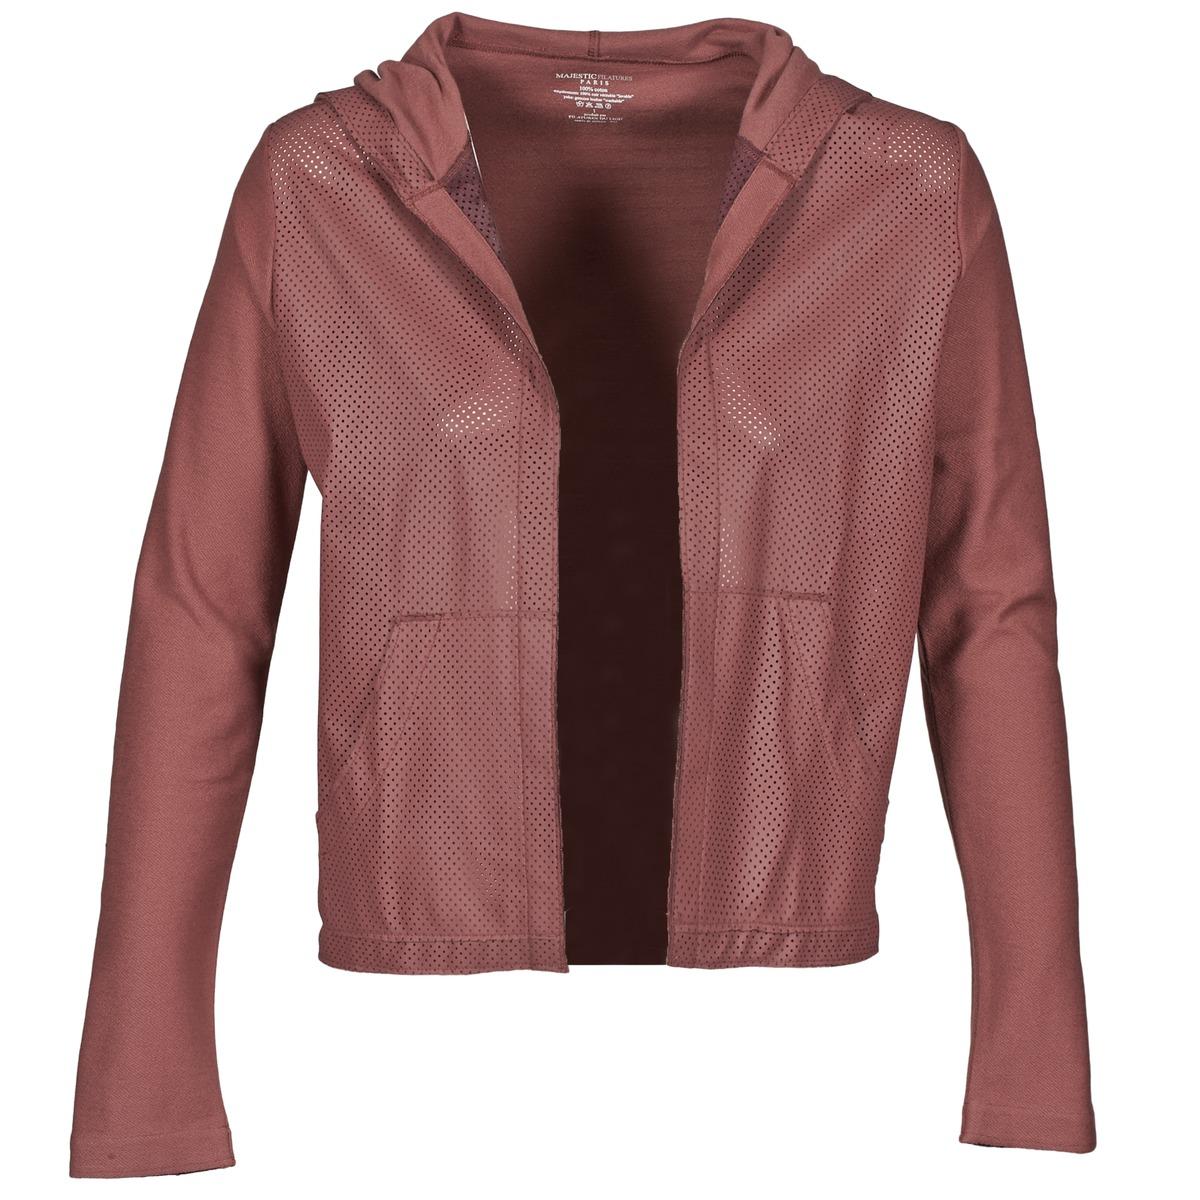 Blazere / jakker Majestic  3103